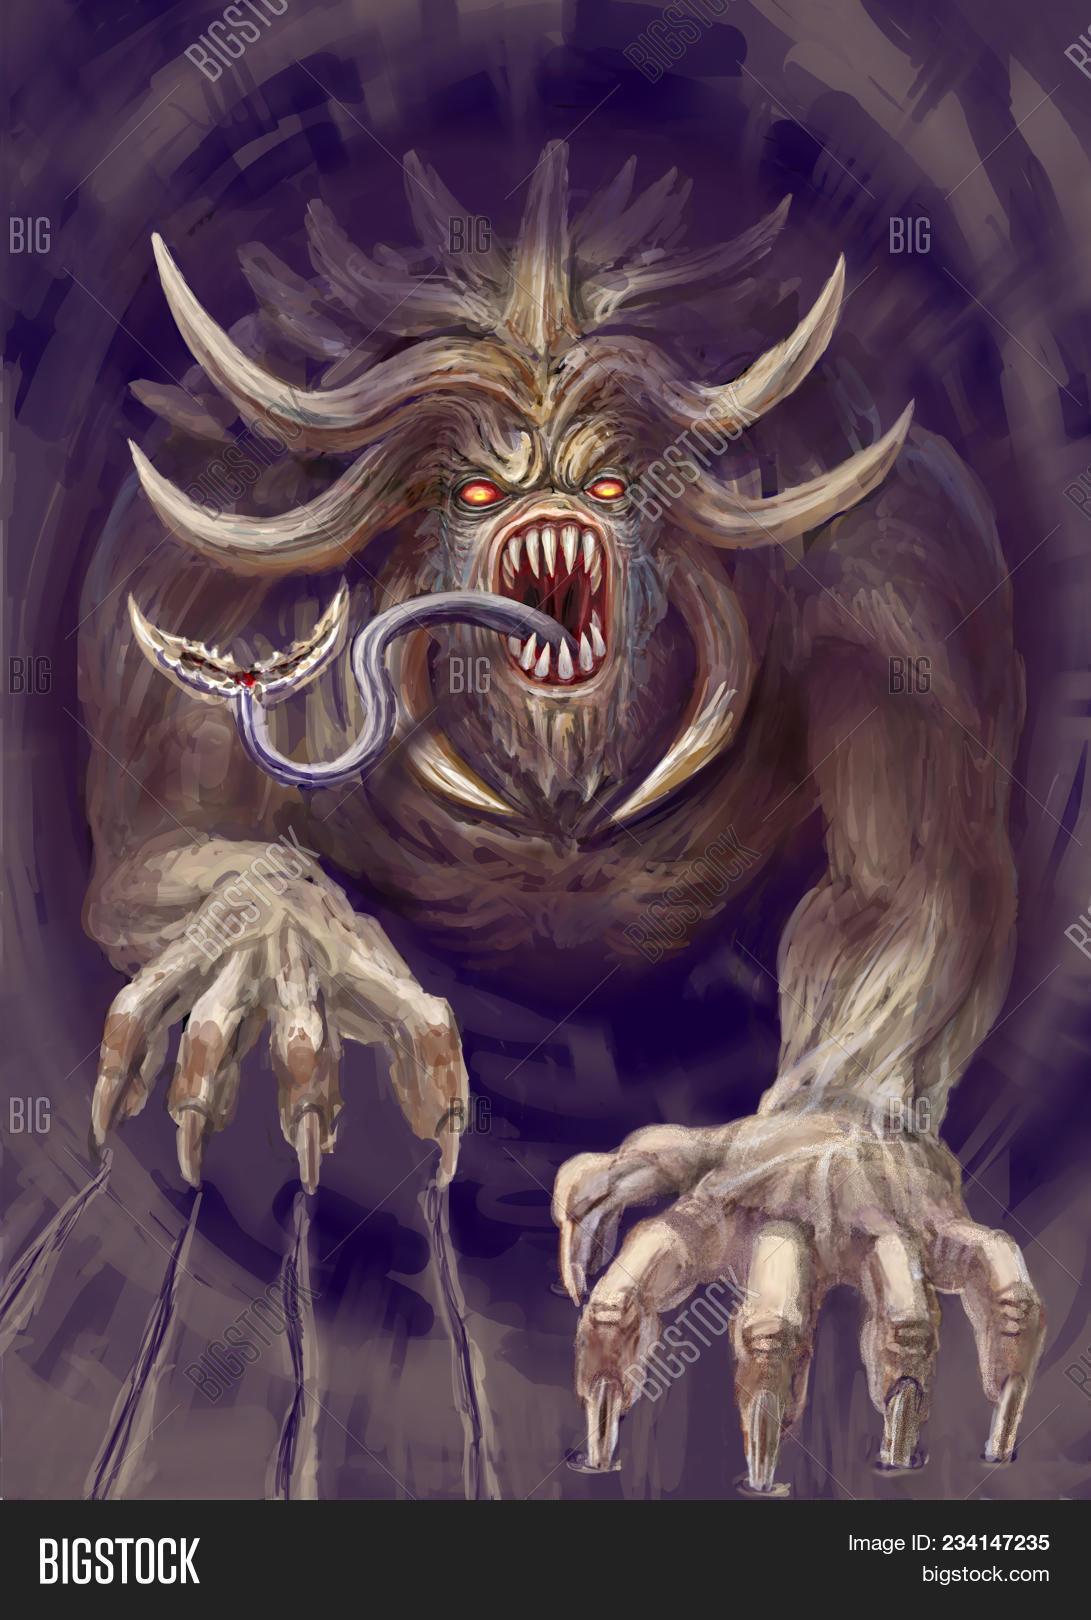 Huge Monster Horns Image Photo Free Trial Bigstock